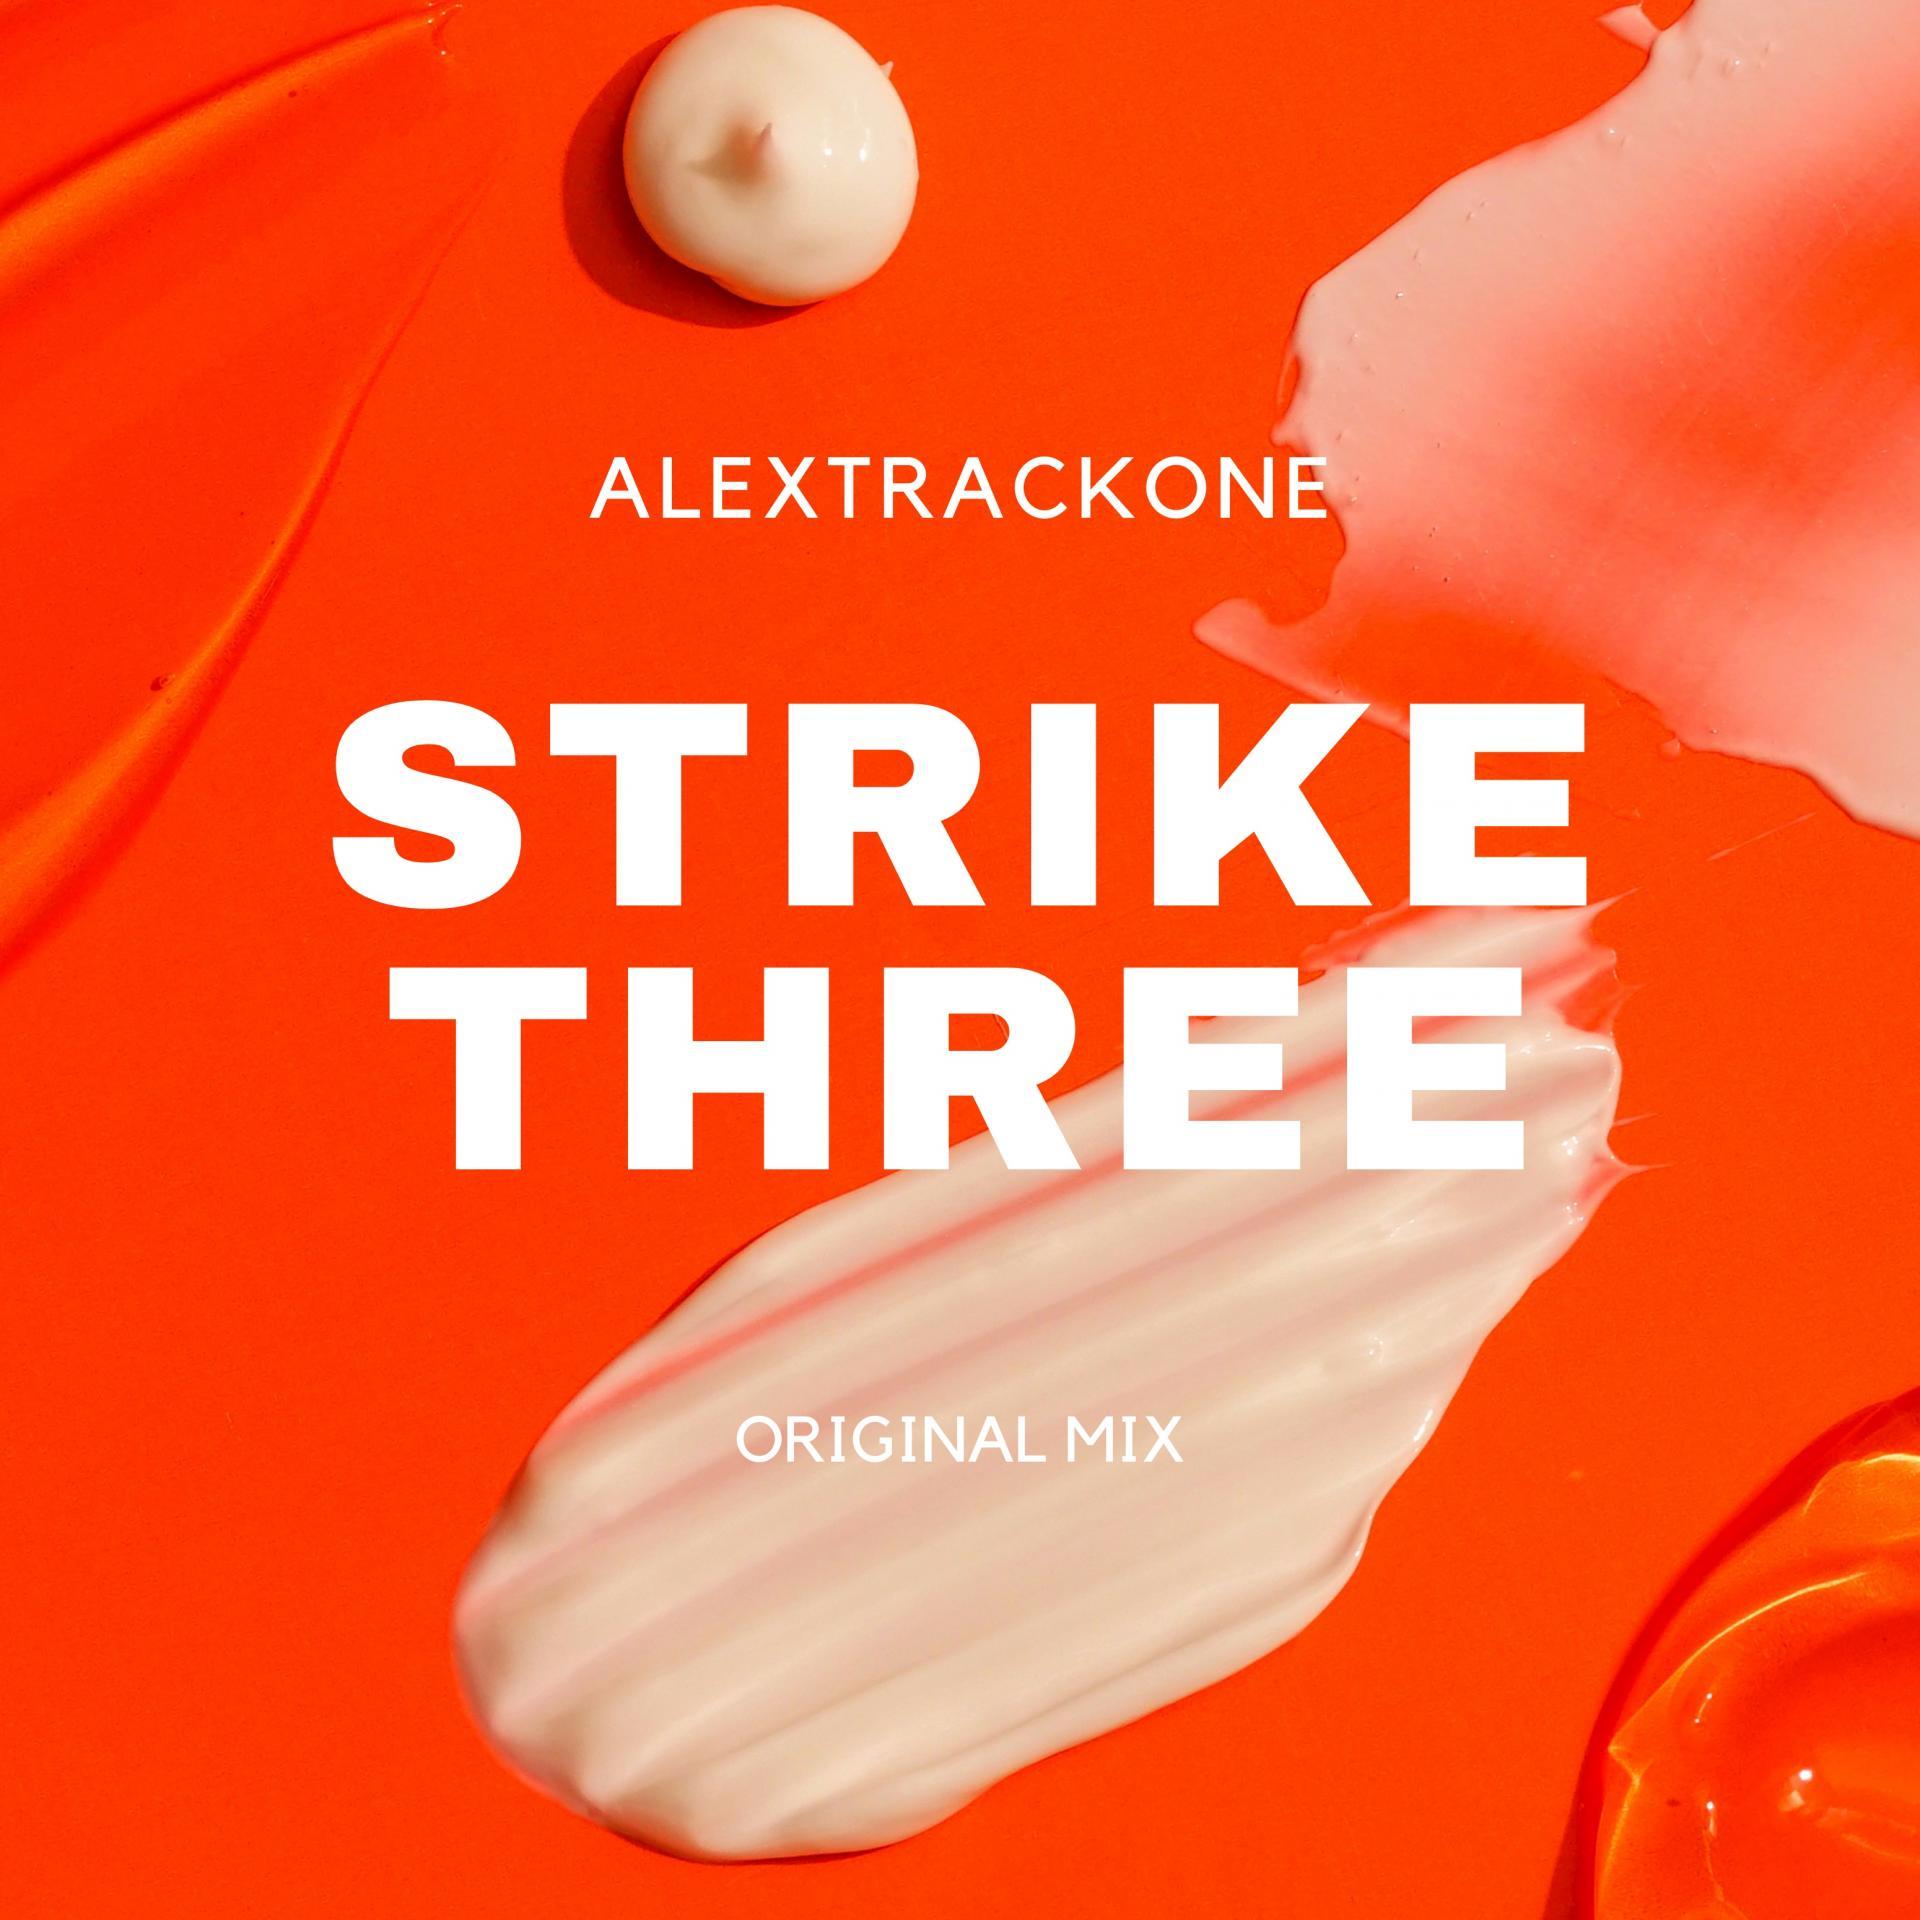 STRIKE THREE -ORIGINAL MIX-